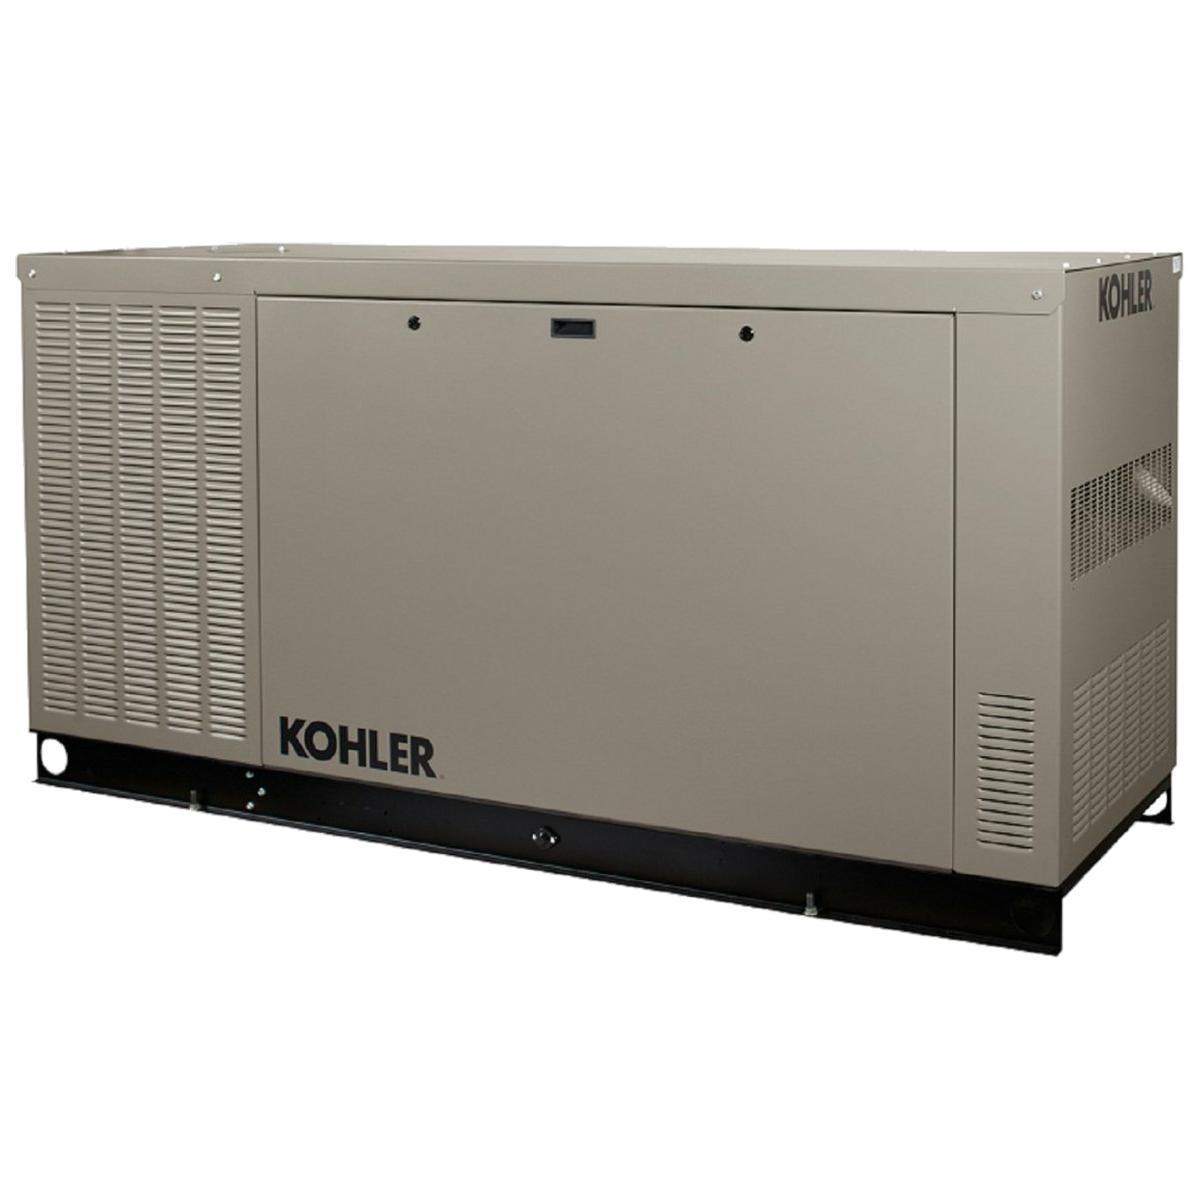 Kohler 38RCLB 38kW Generator